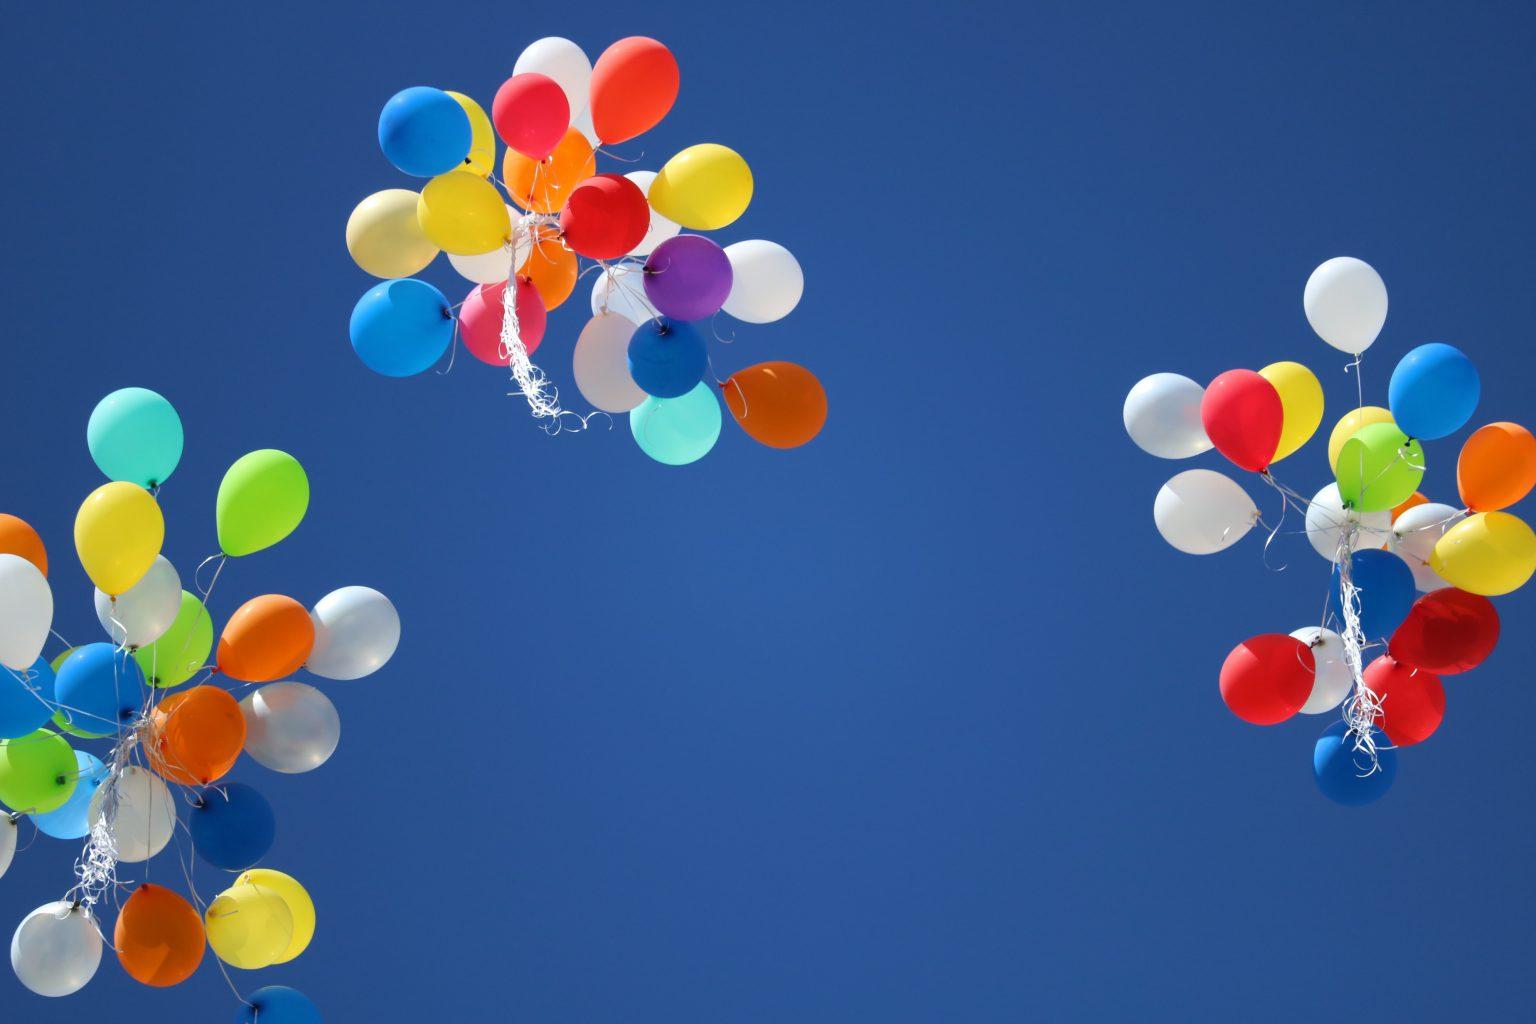 5 Ways to Market Your Next Fundraising Initiative Amid COVID-19